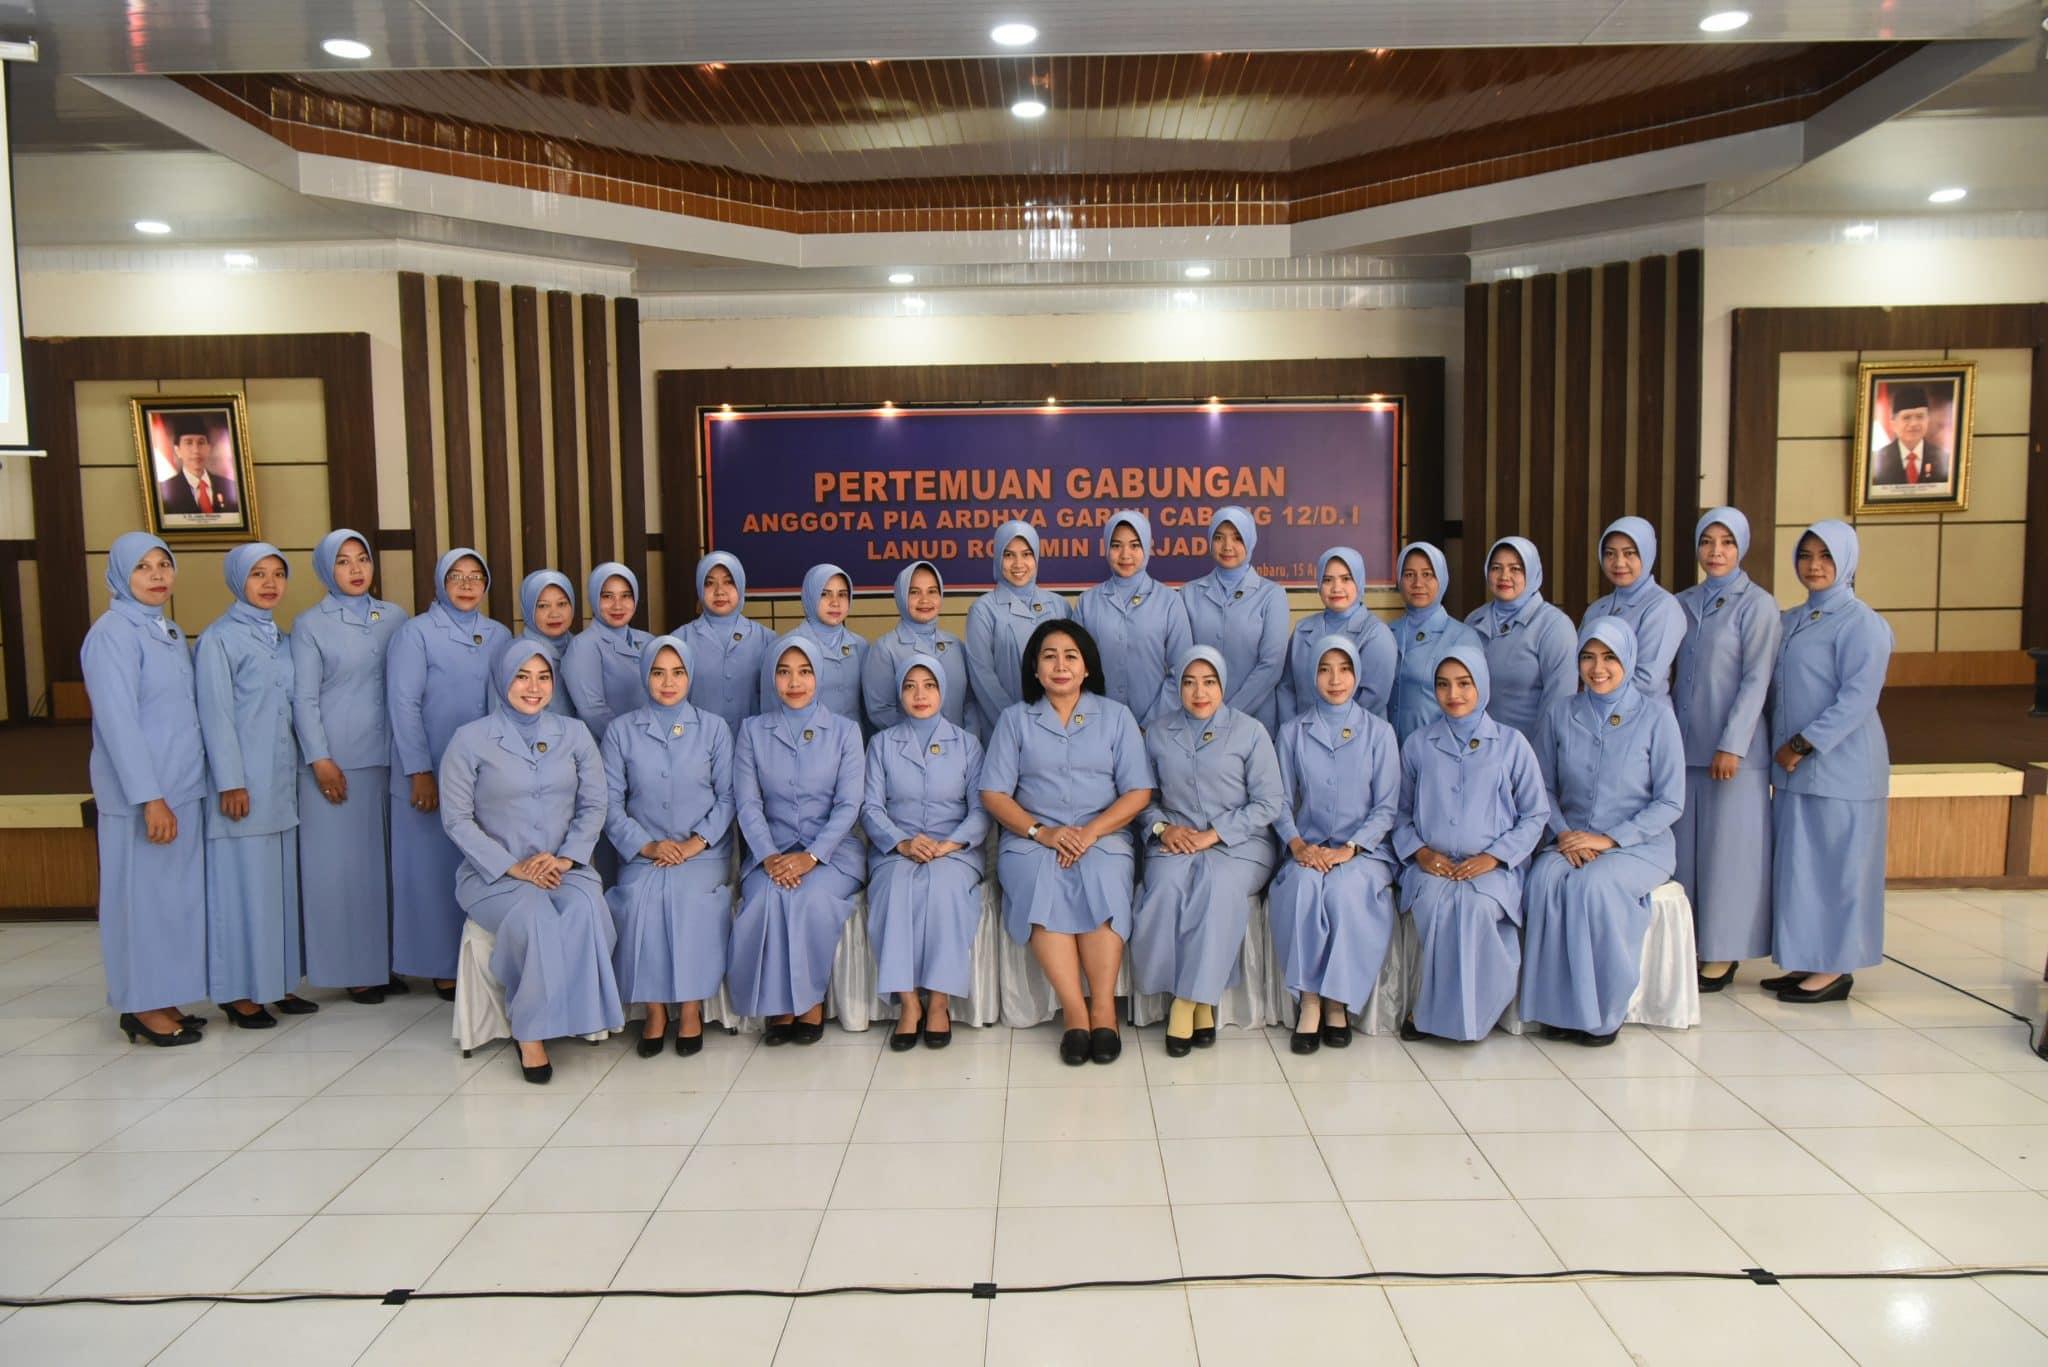 Ny. Irenne Moningka Jalin Silaturrahmi dengan Anggota PIA Ardhya Garini